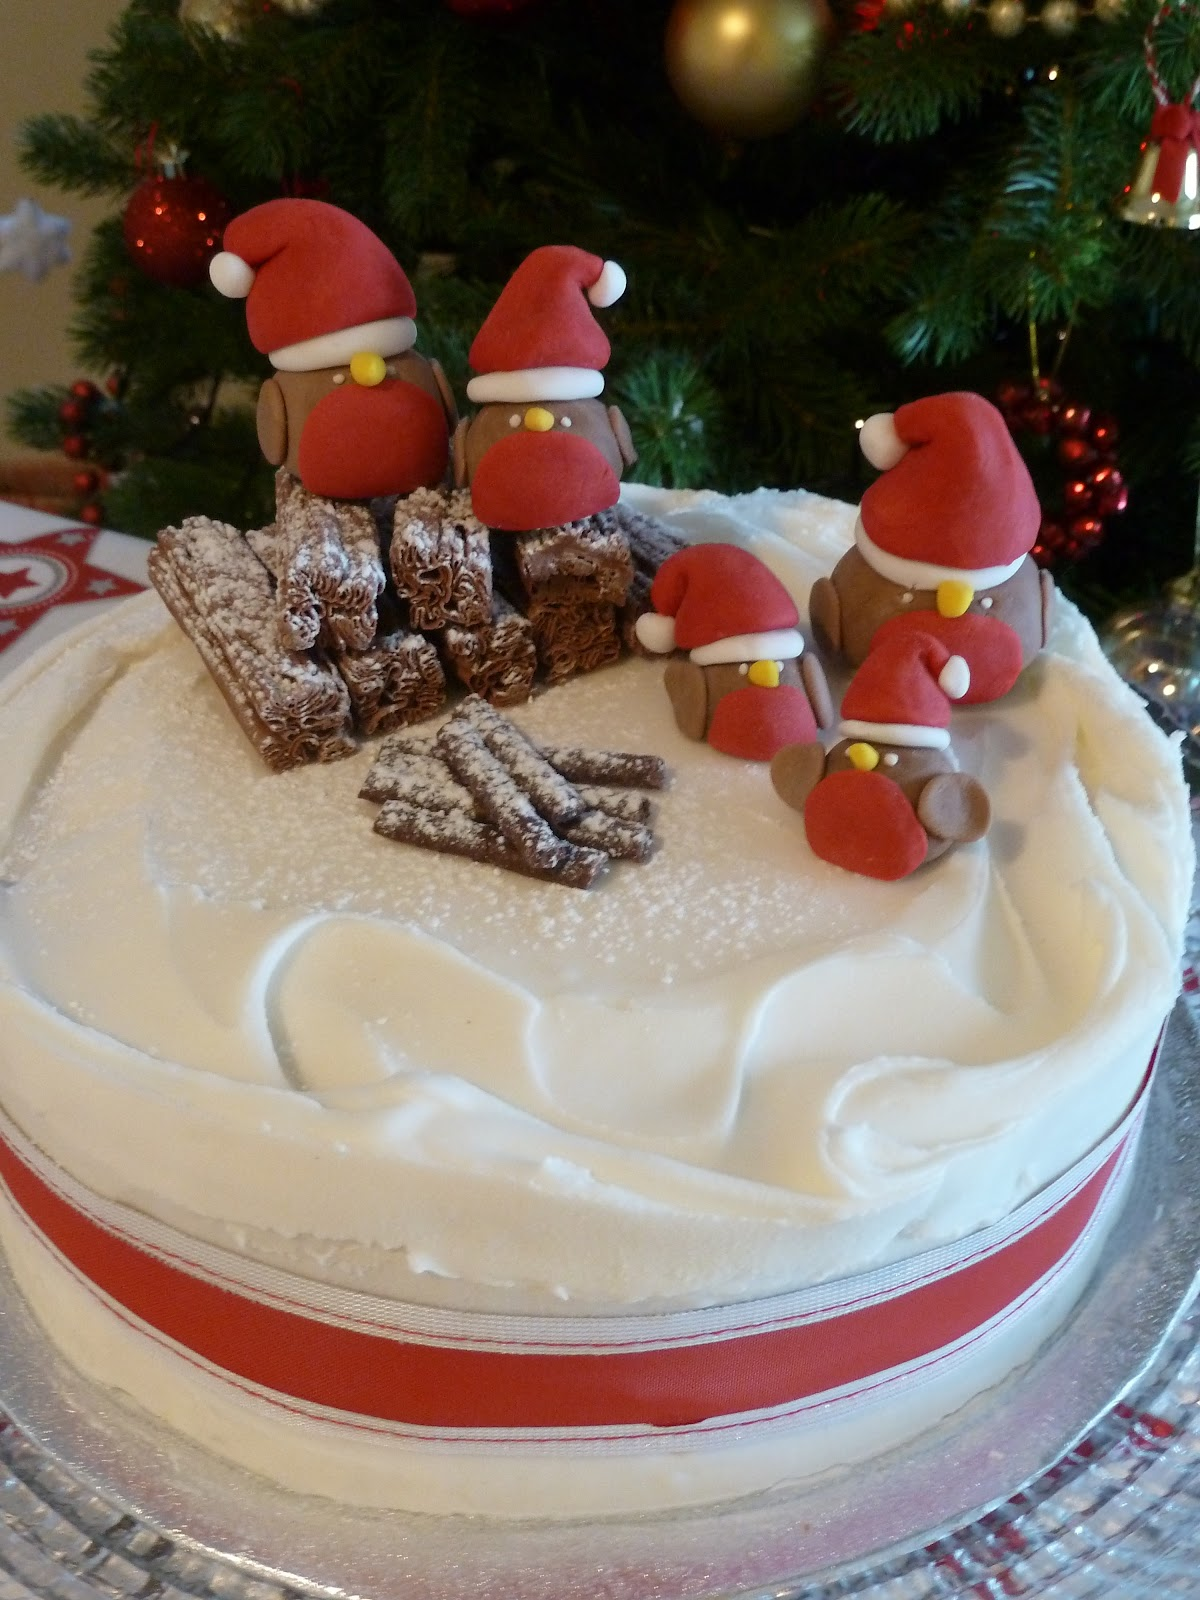 Easy Christmas Cake Decorating Ideas.Christmas Cake Inspiration To Create Festive Robins Cake